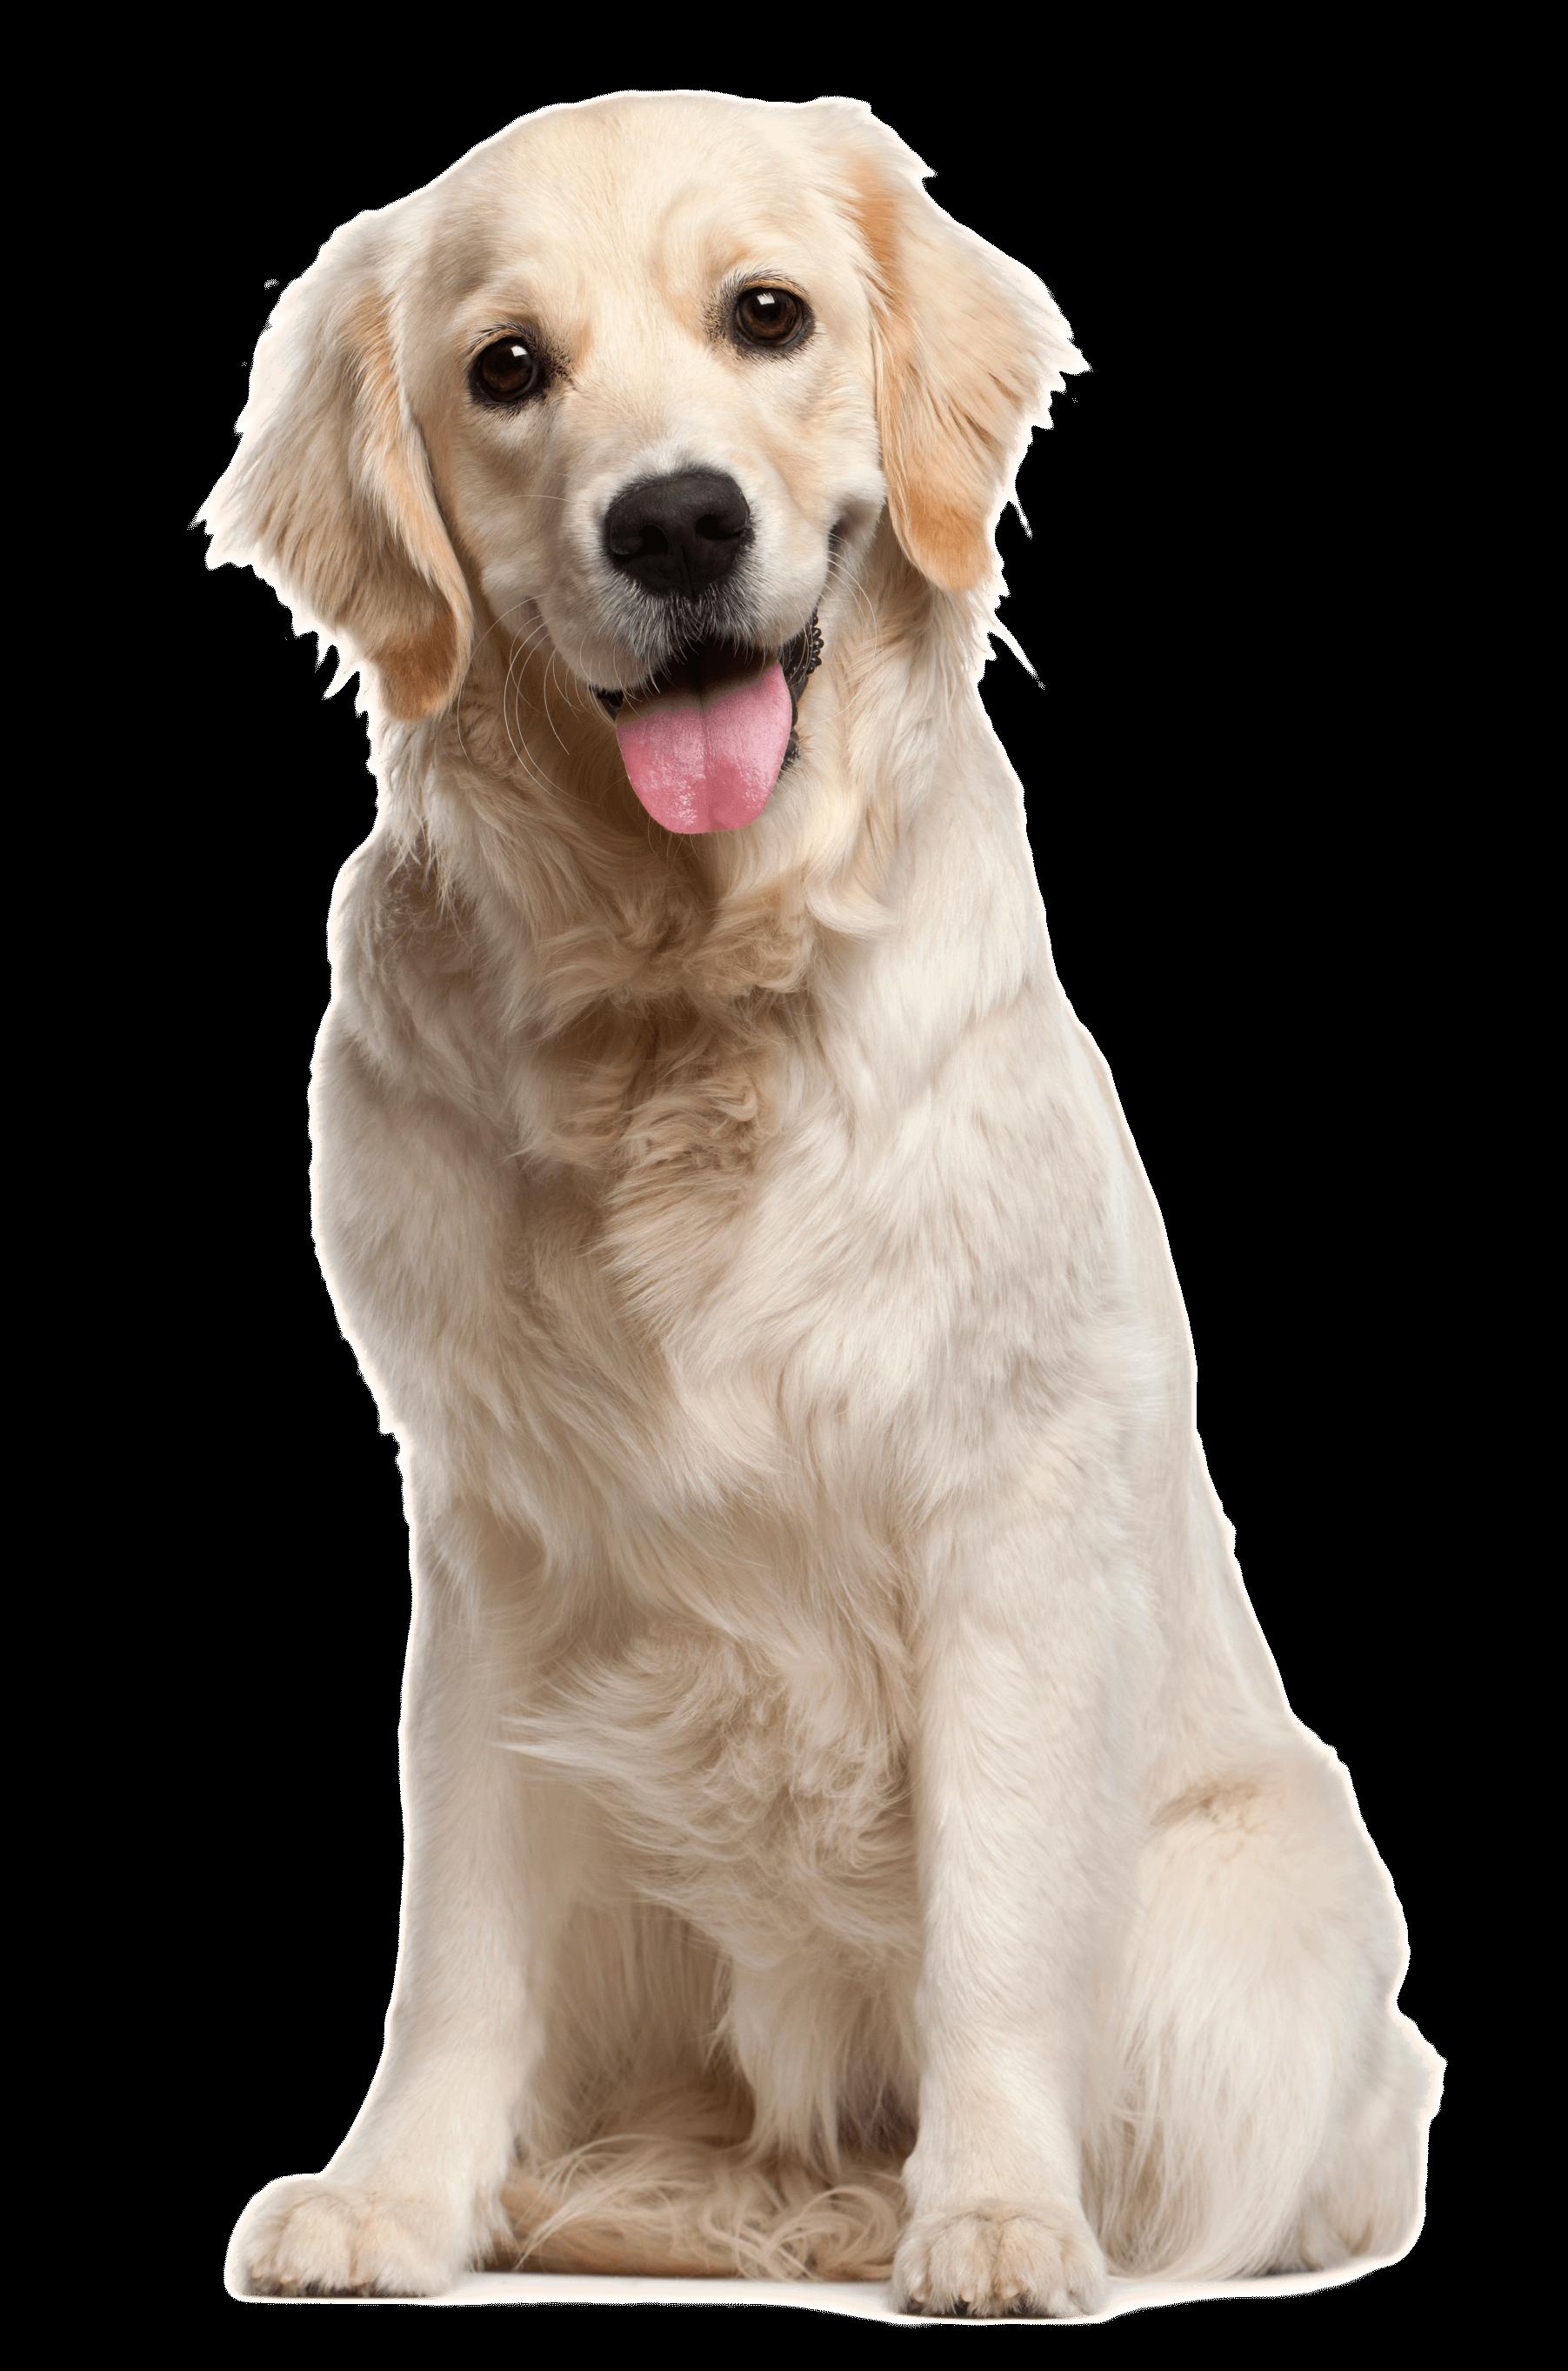 Dog PNG File - Dog PNG